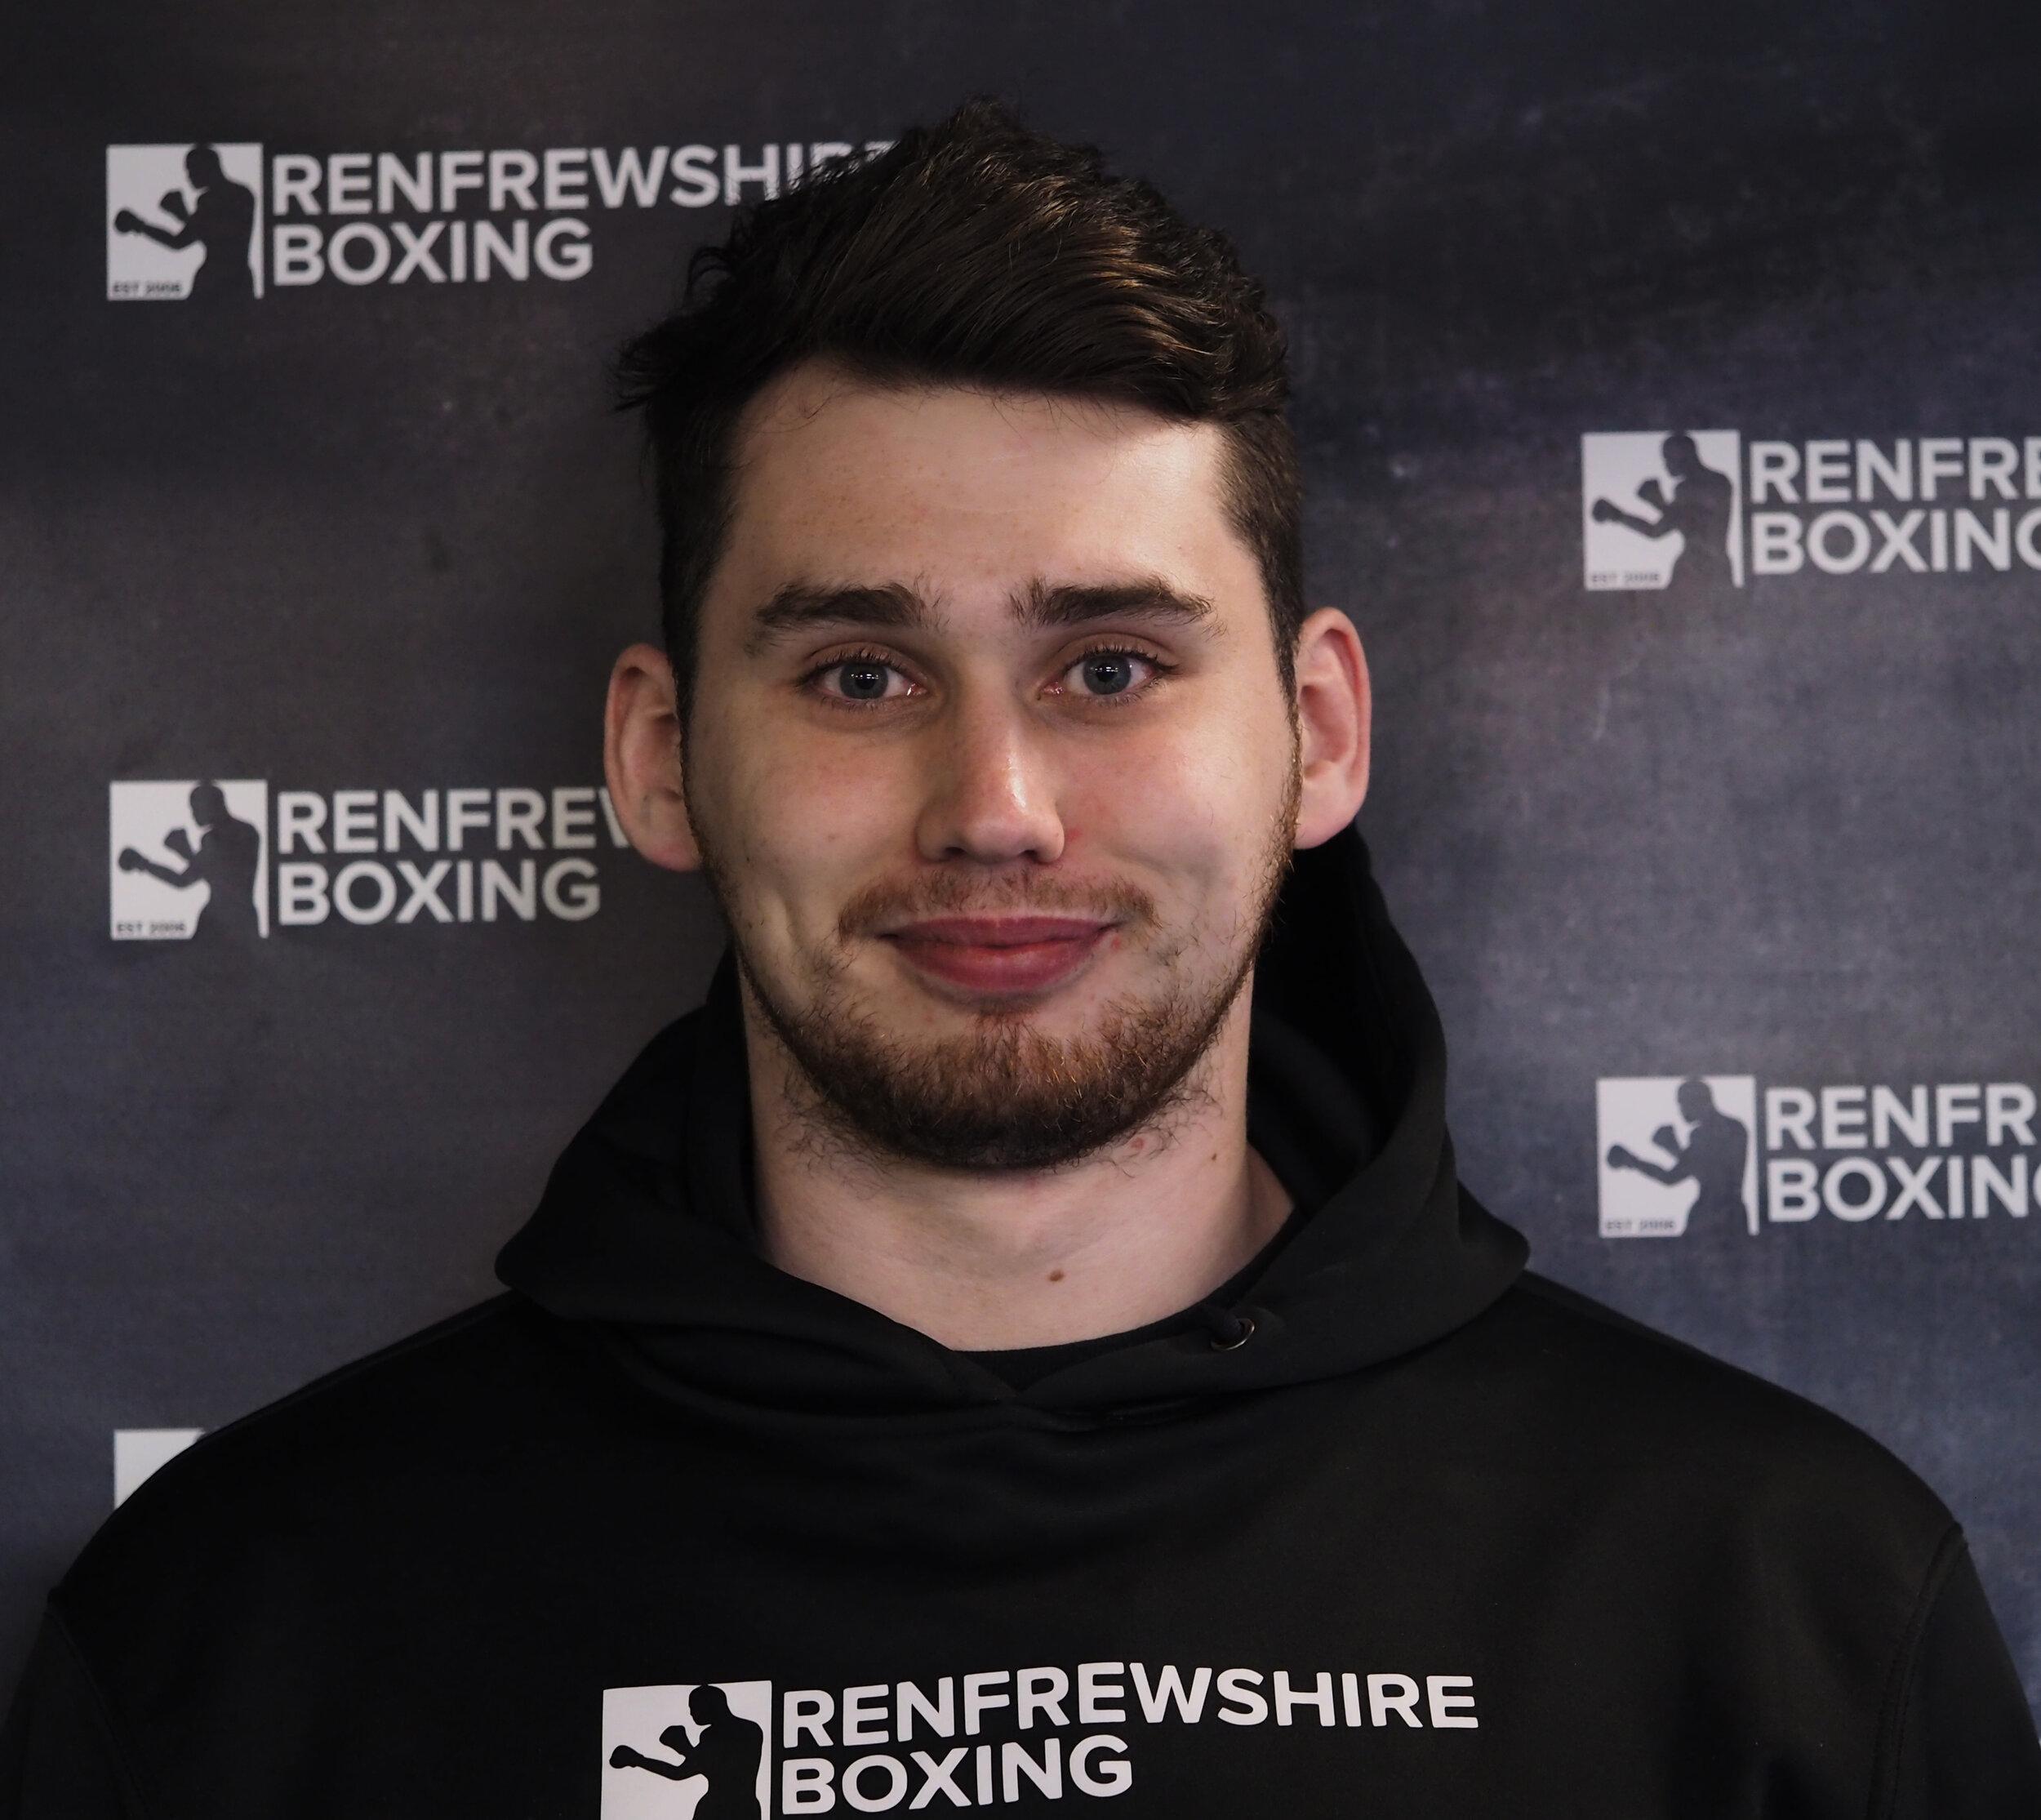 Renfrewshire Boxing  (22).jpg